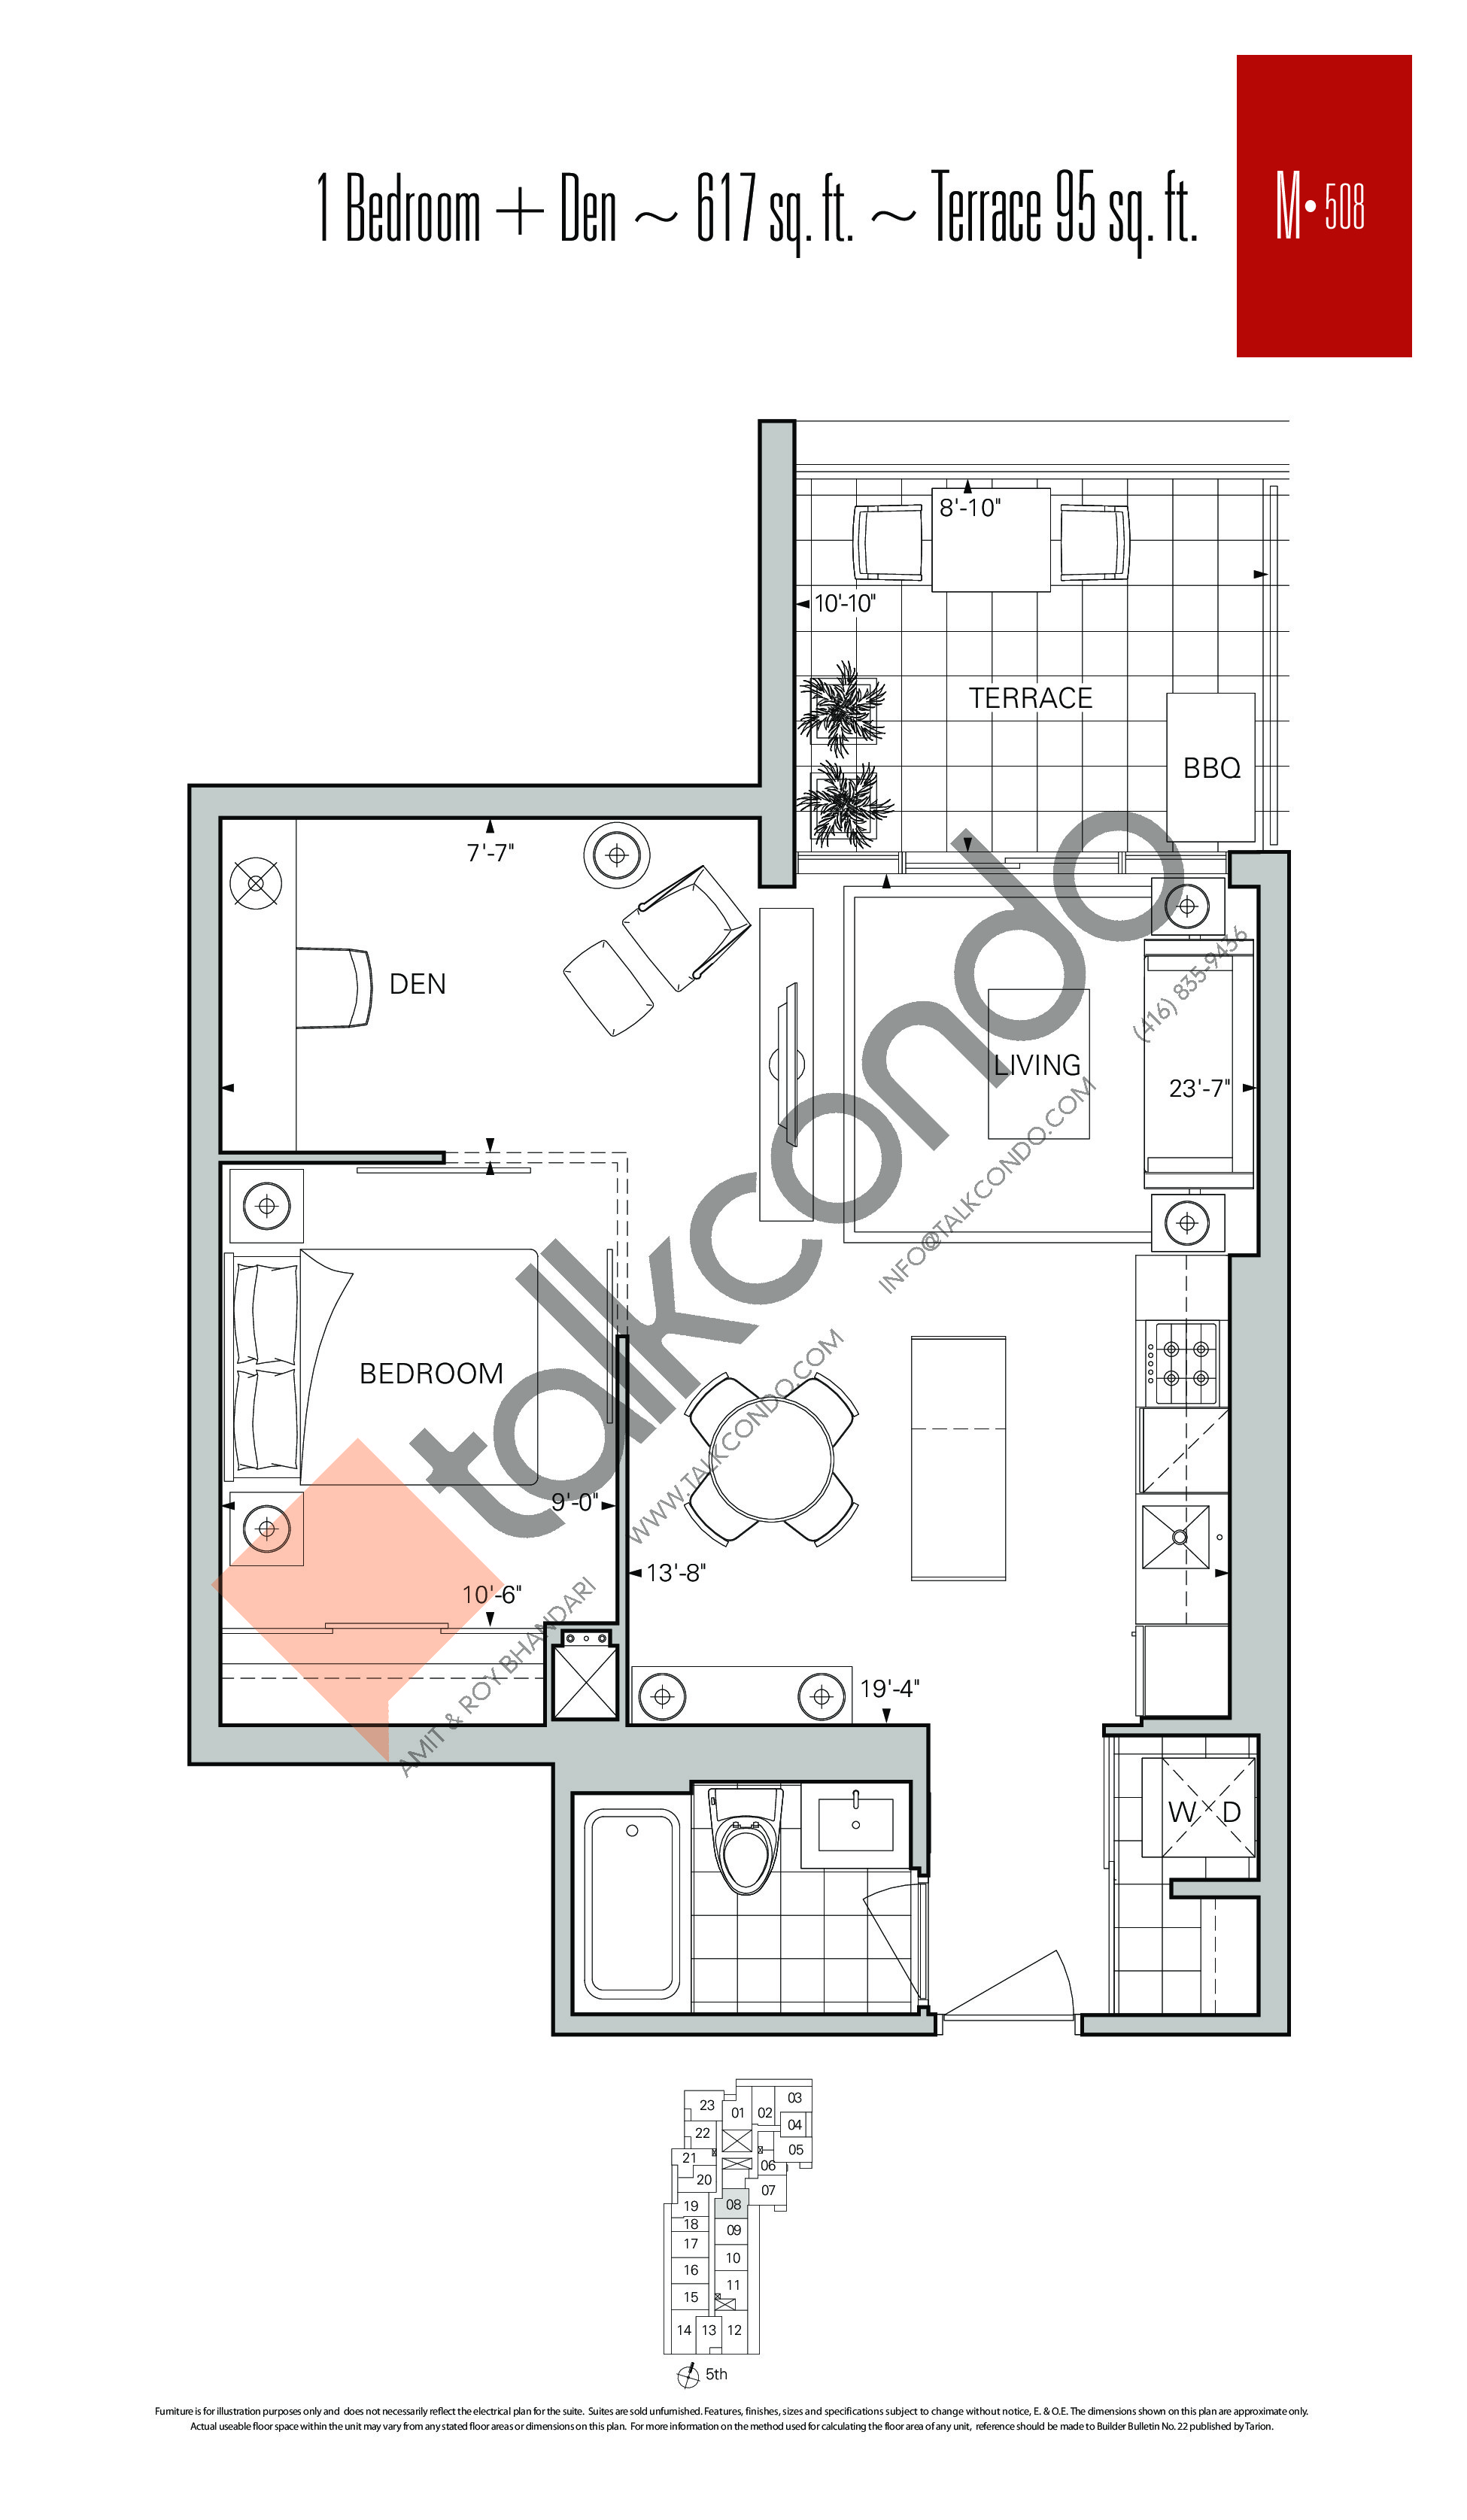 M-508 Floor Plan at Rise Condos - 617 sq.ft